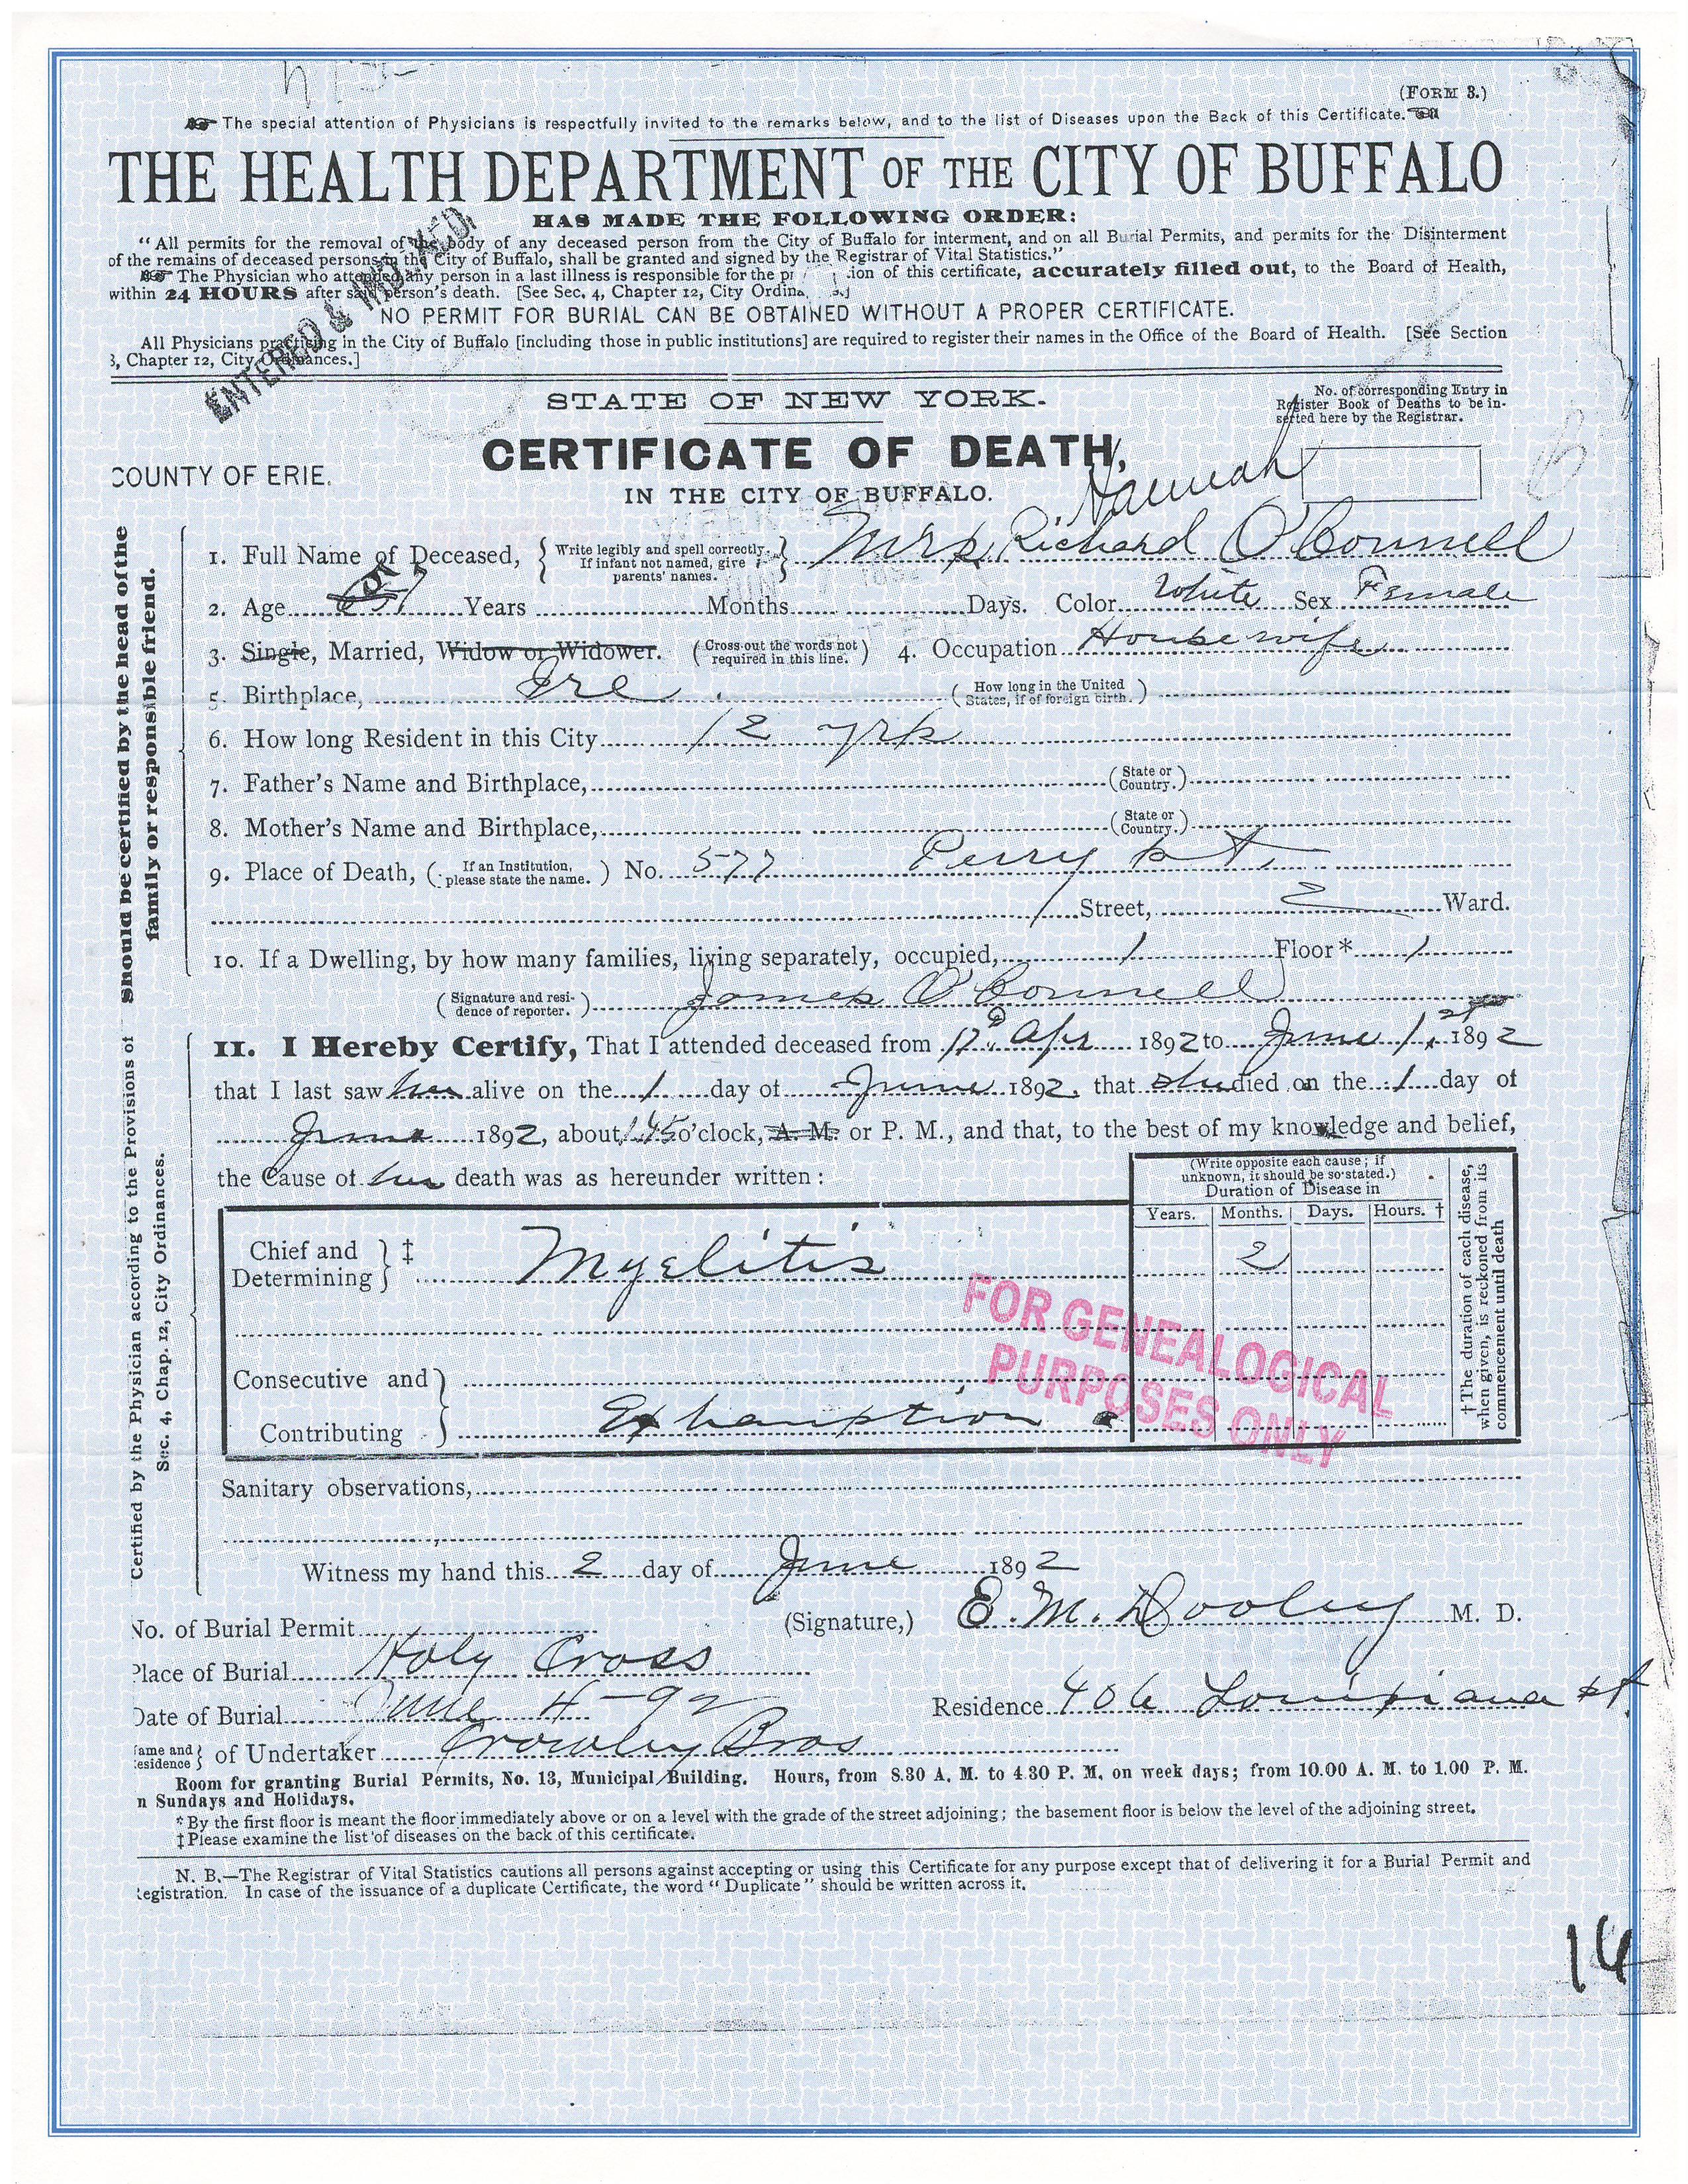 Johanna Kennedy Death Record.JPG